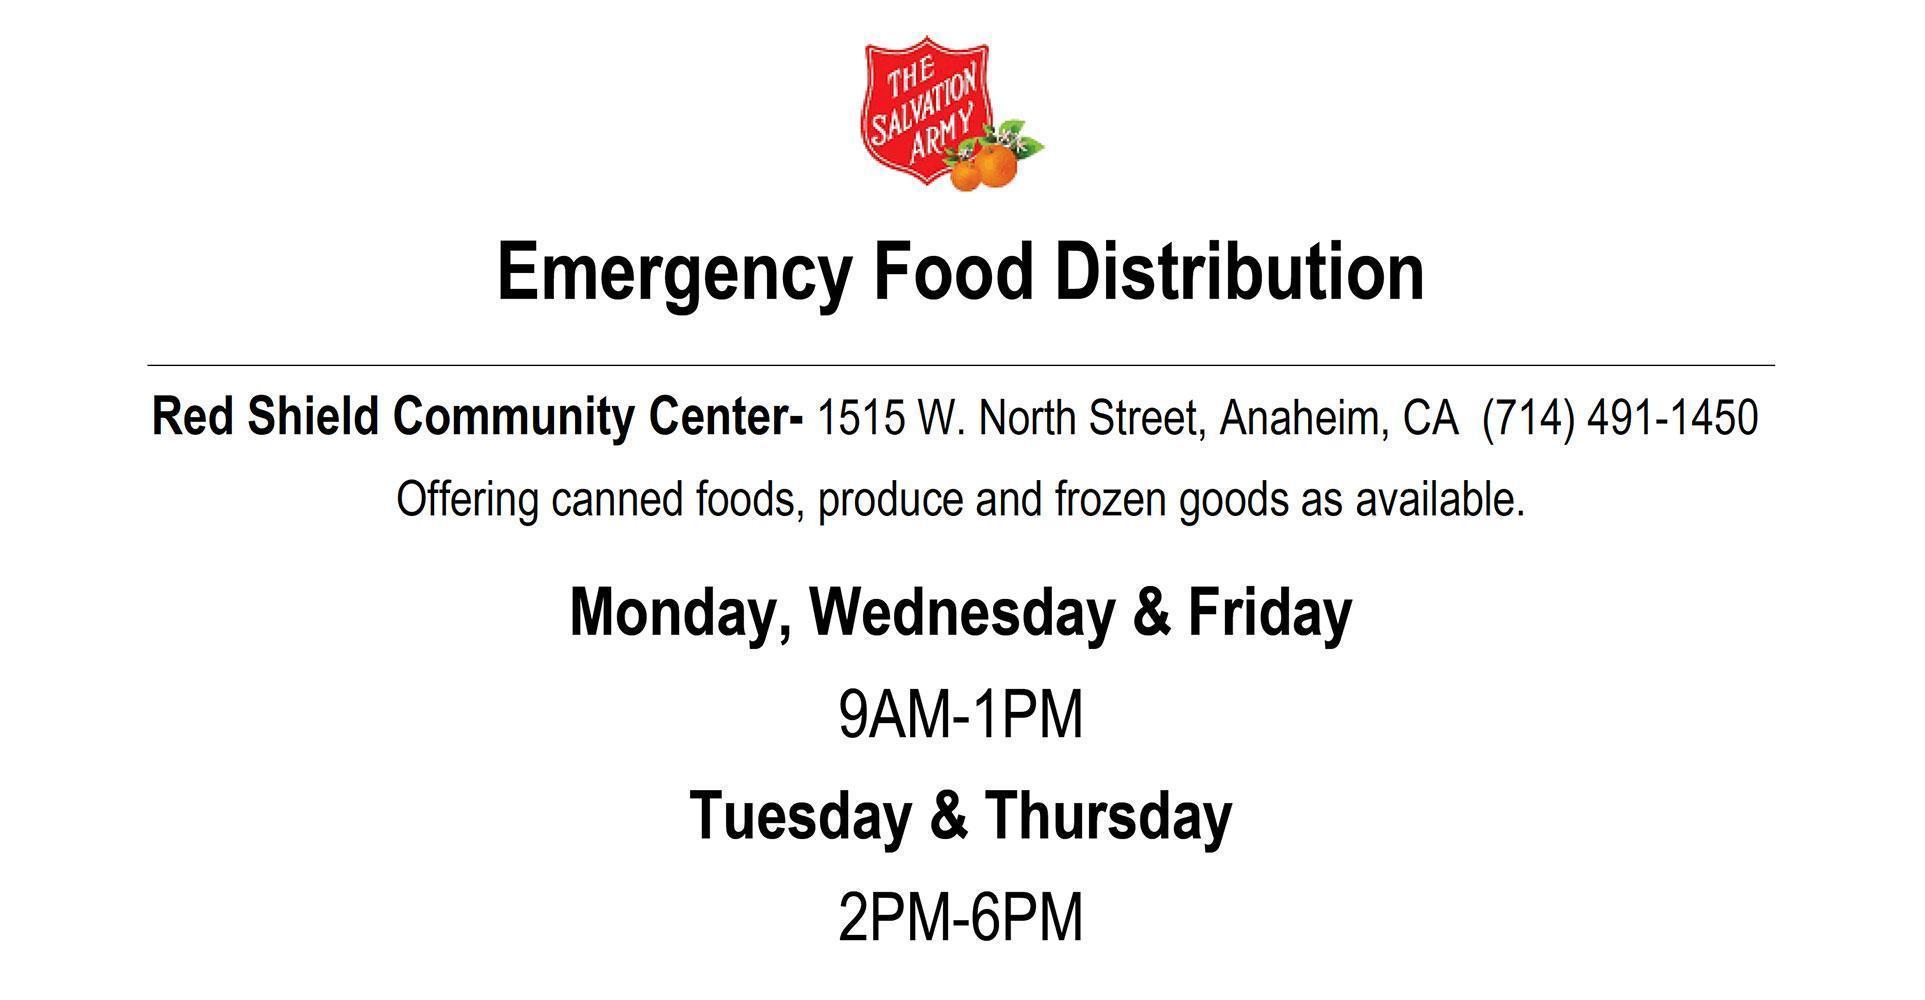 Emergency Food Distribution Information